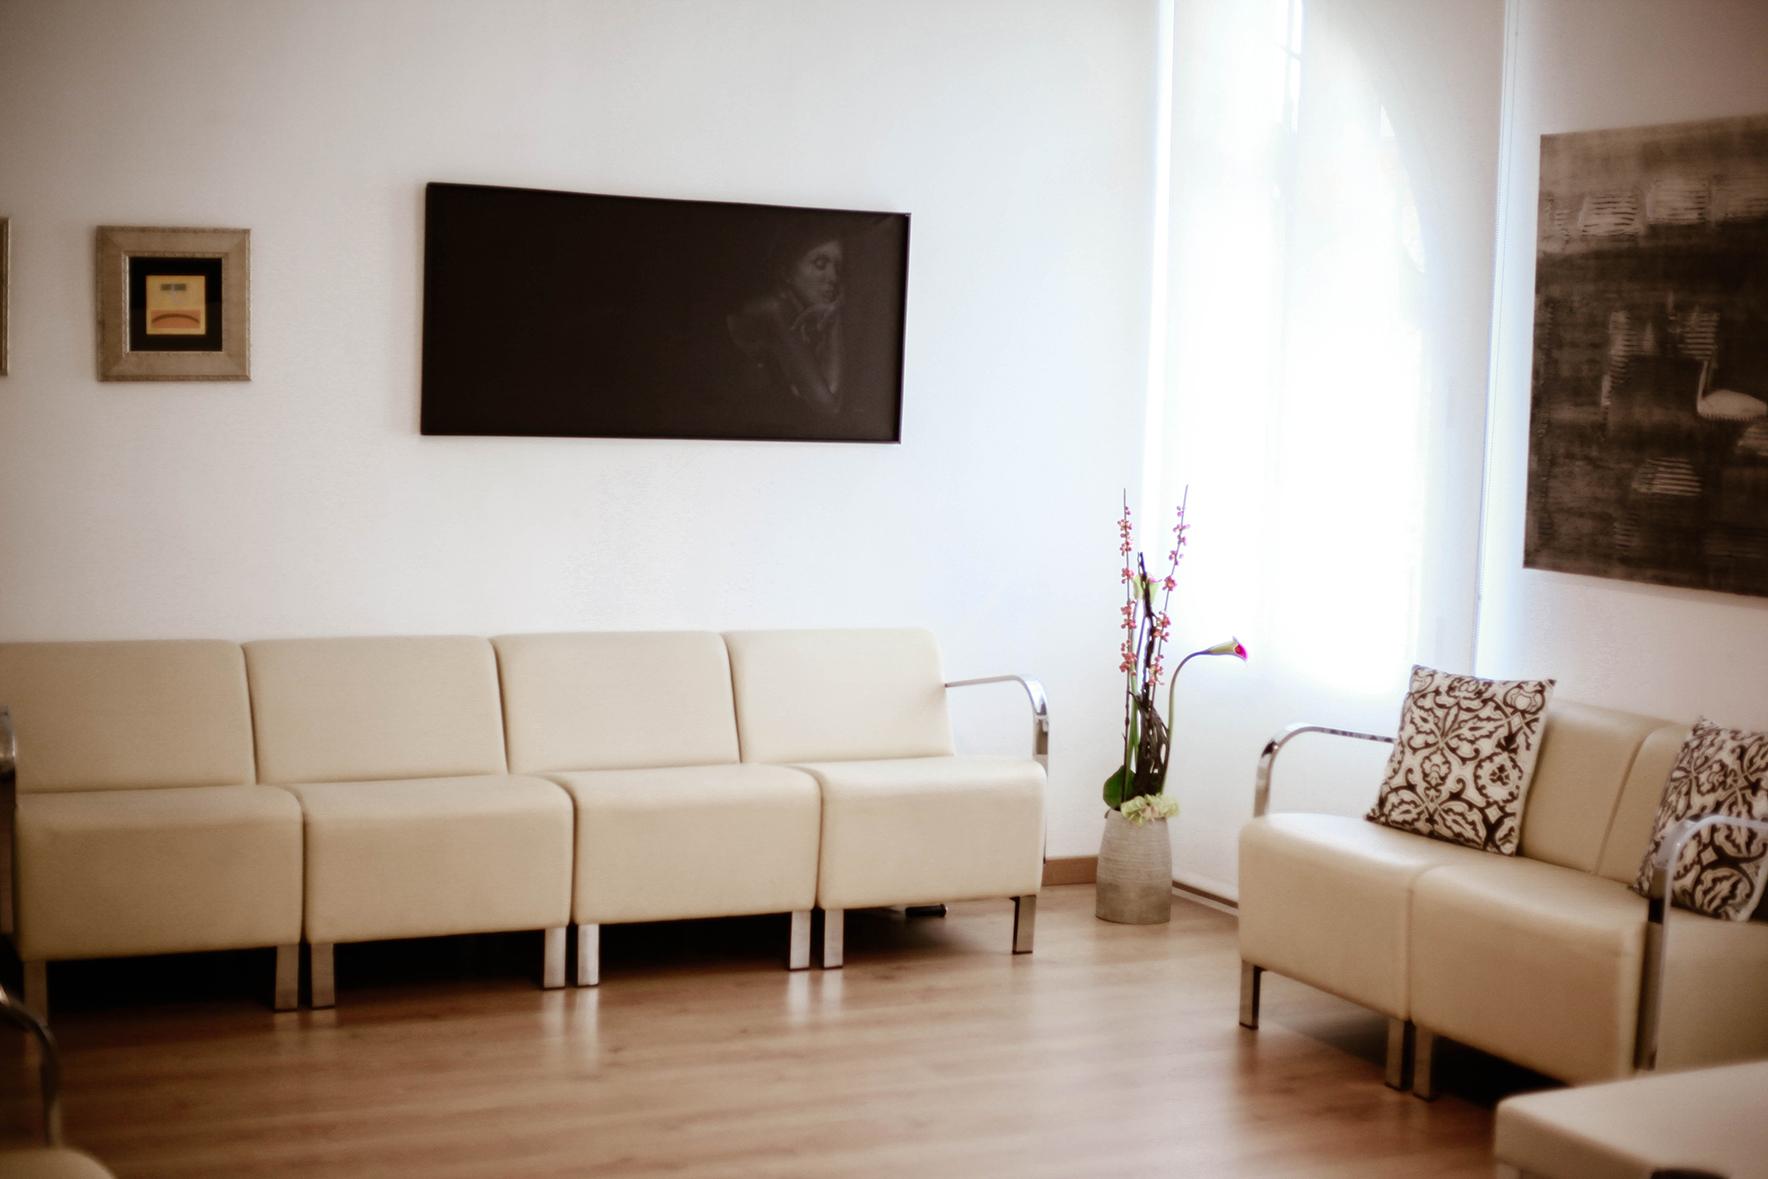 Consulta clínica Dr. Puig en Valencia